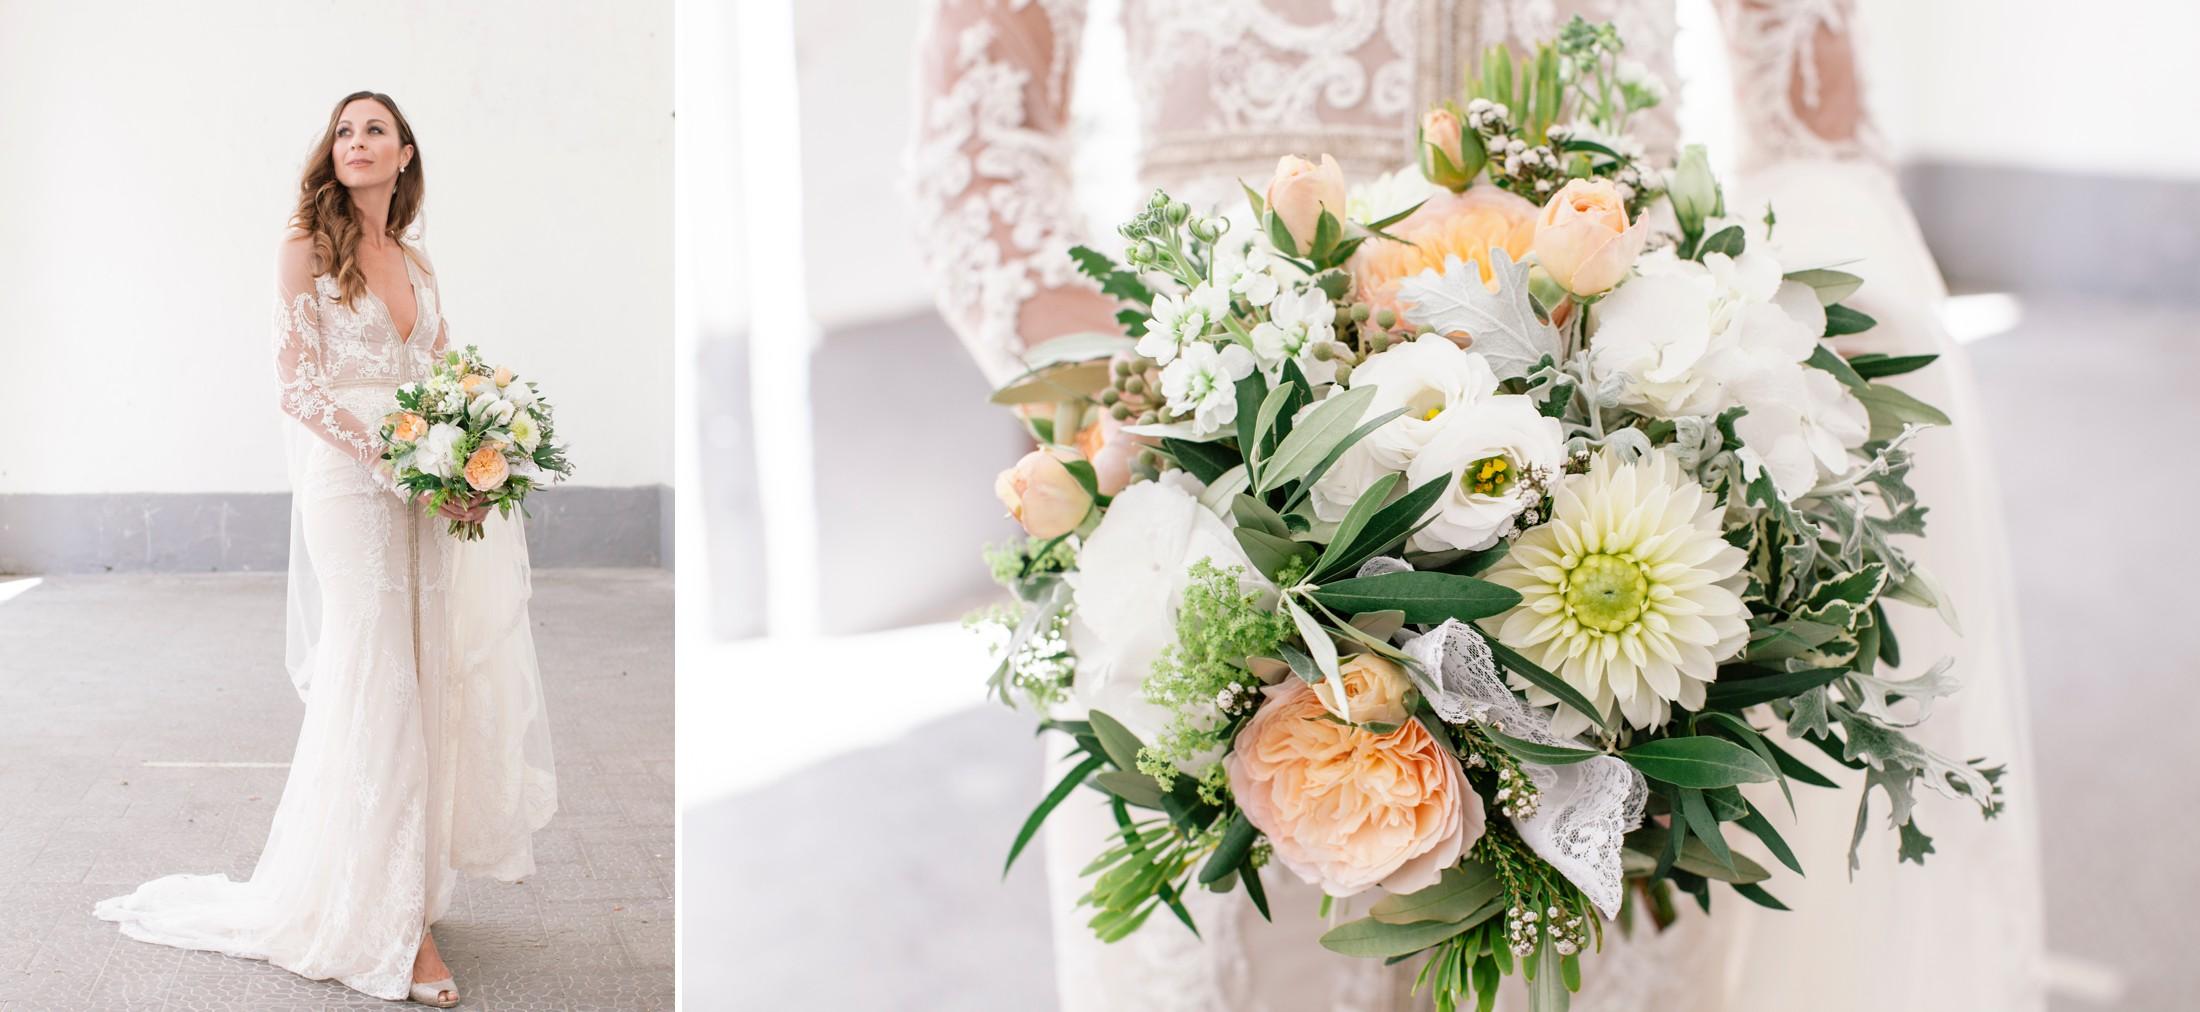 wedding at villa cimbrone bride's portrait and wedding bouquet